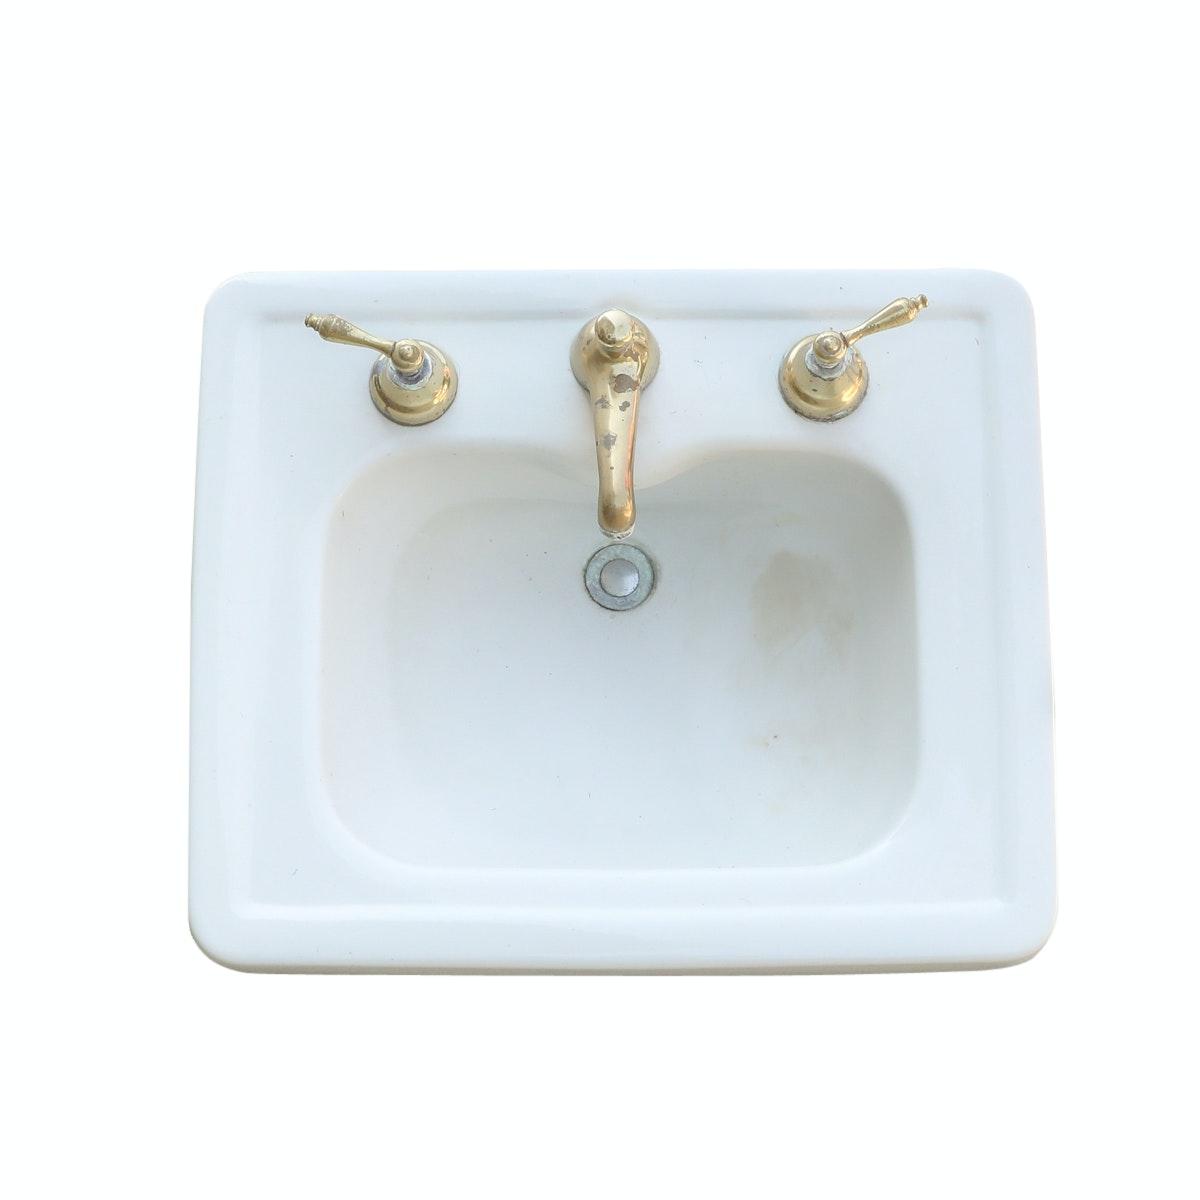 Early 20th Century Bathroom Pedestal Sink by Standard